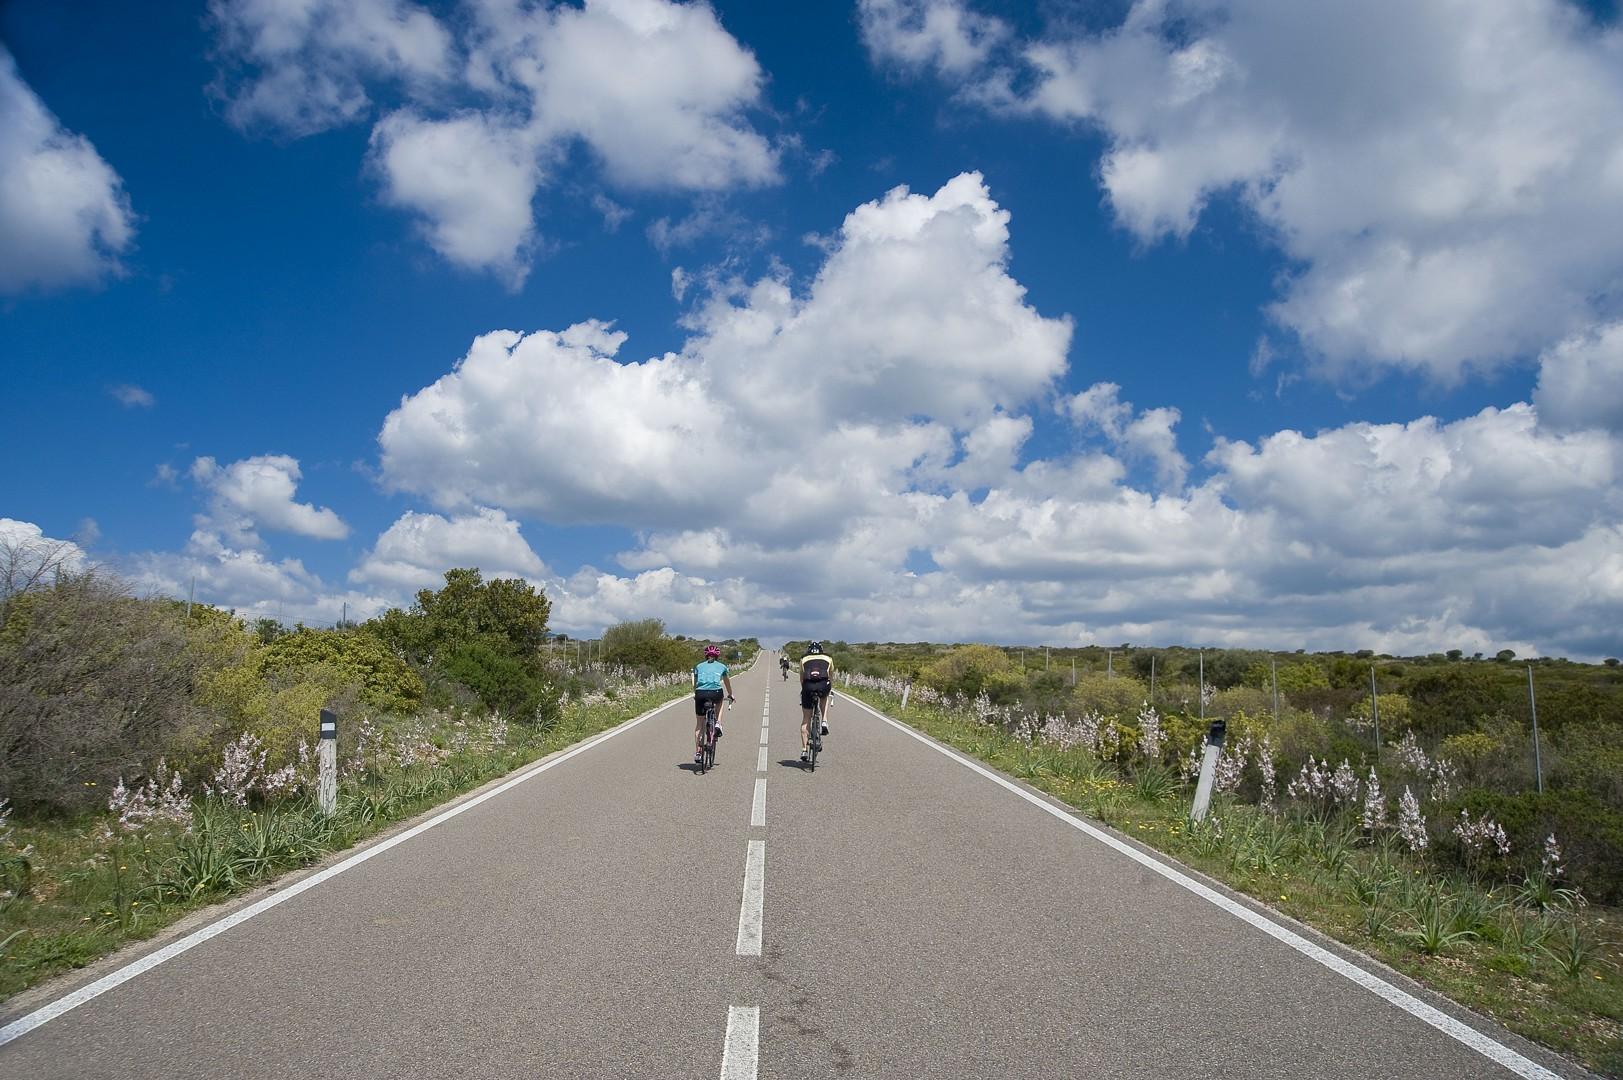 ESP2144.jpg - Italy - Sardinia - Mountain Explorer - Guided Road Cycling Holiday - Italia Road Cycling